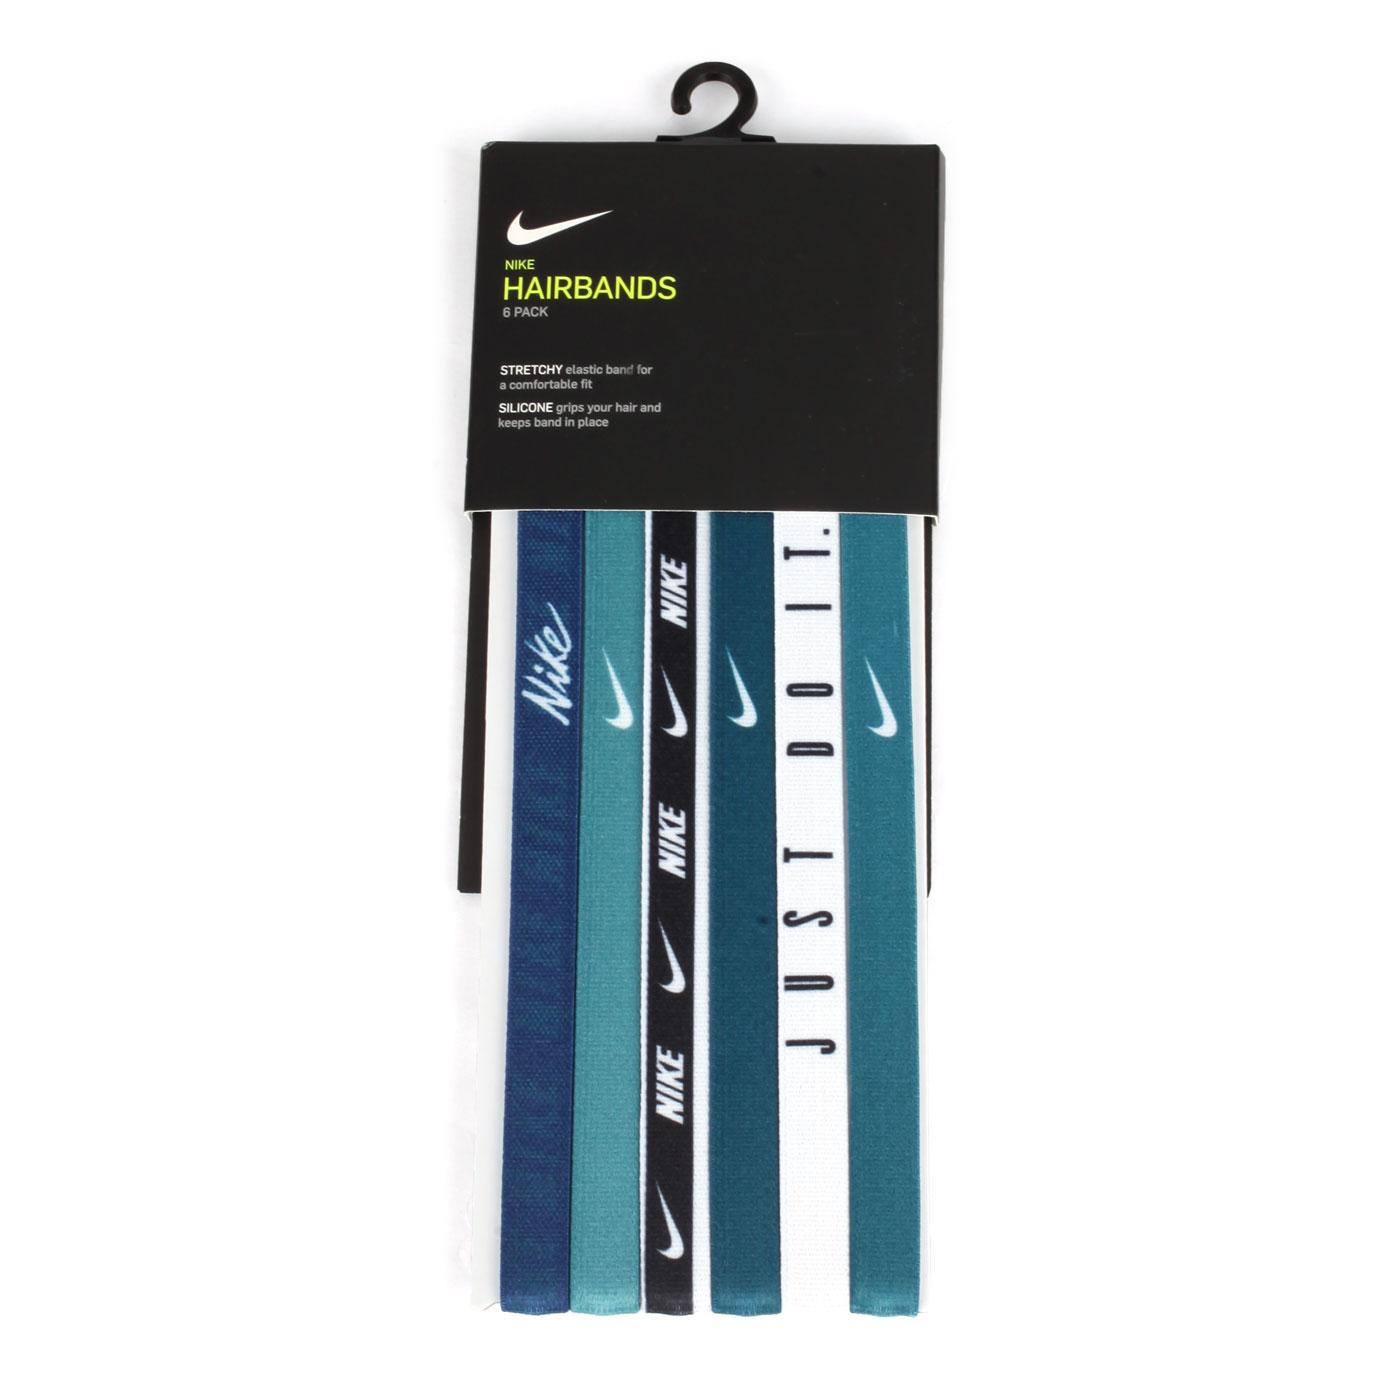 NIKE 印花髮帶(6條入) N0002545430OS - 綠白黑丈青